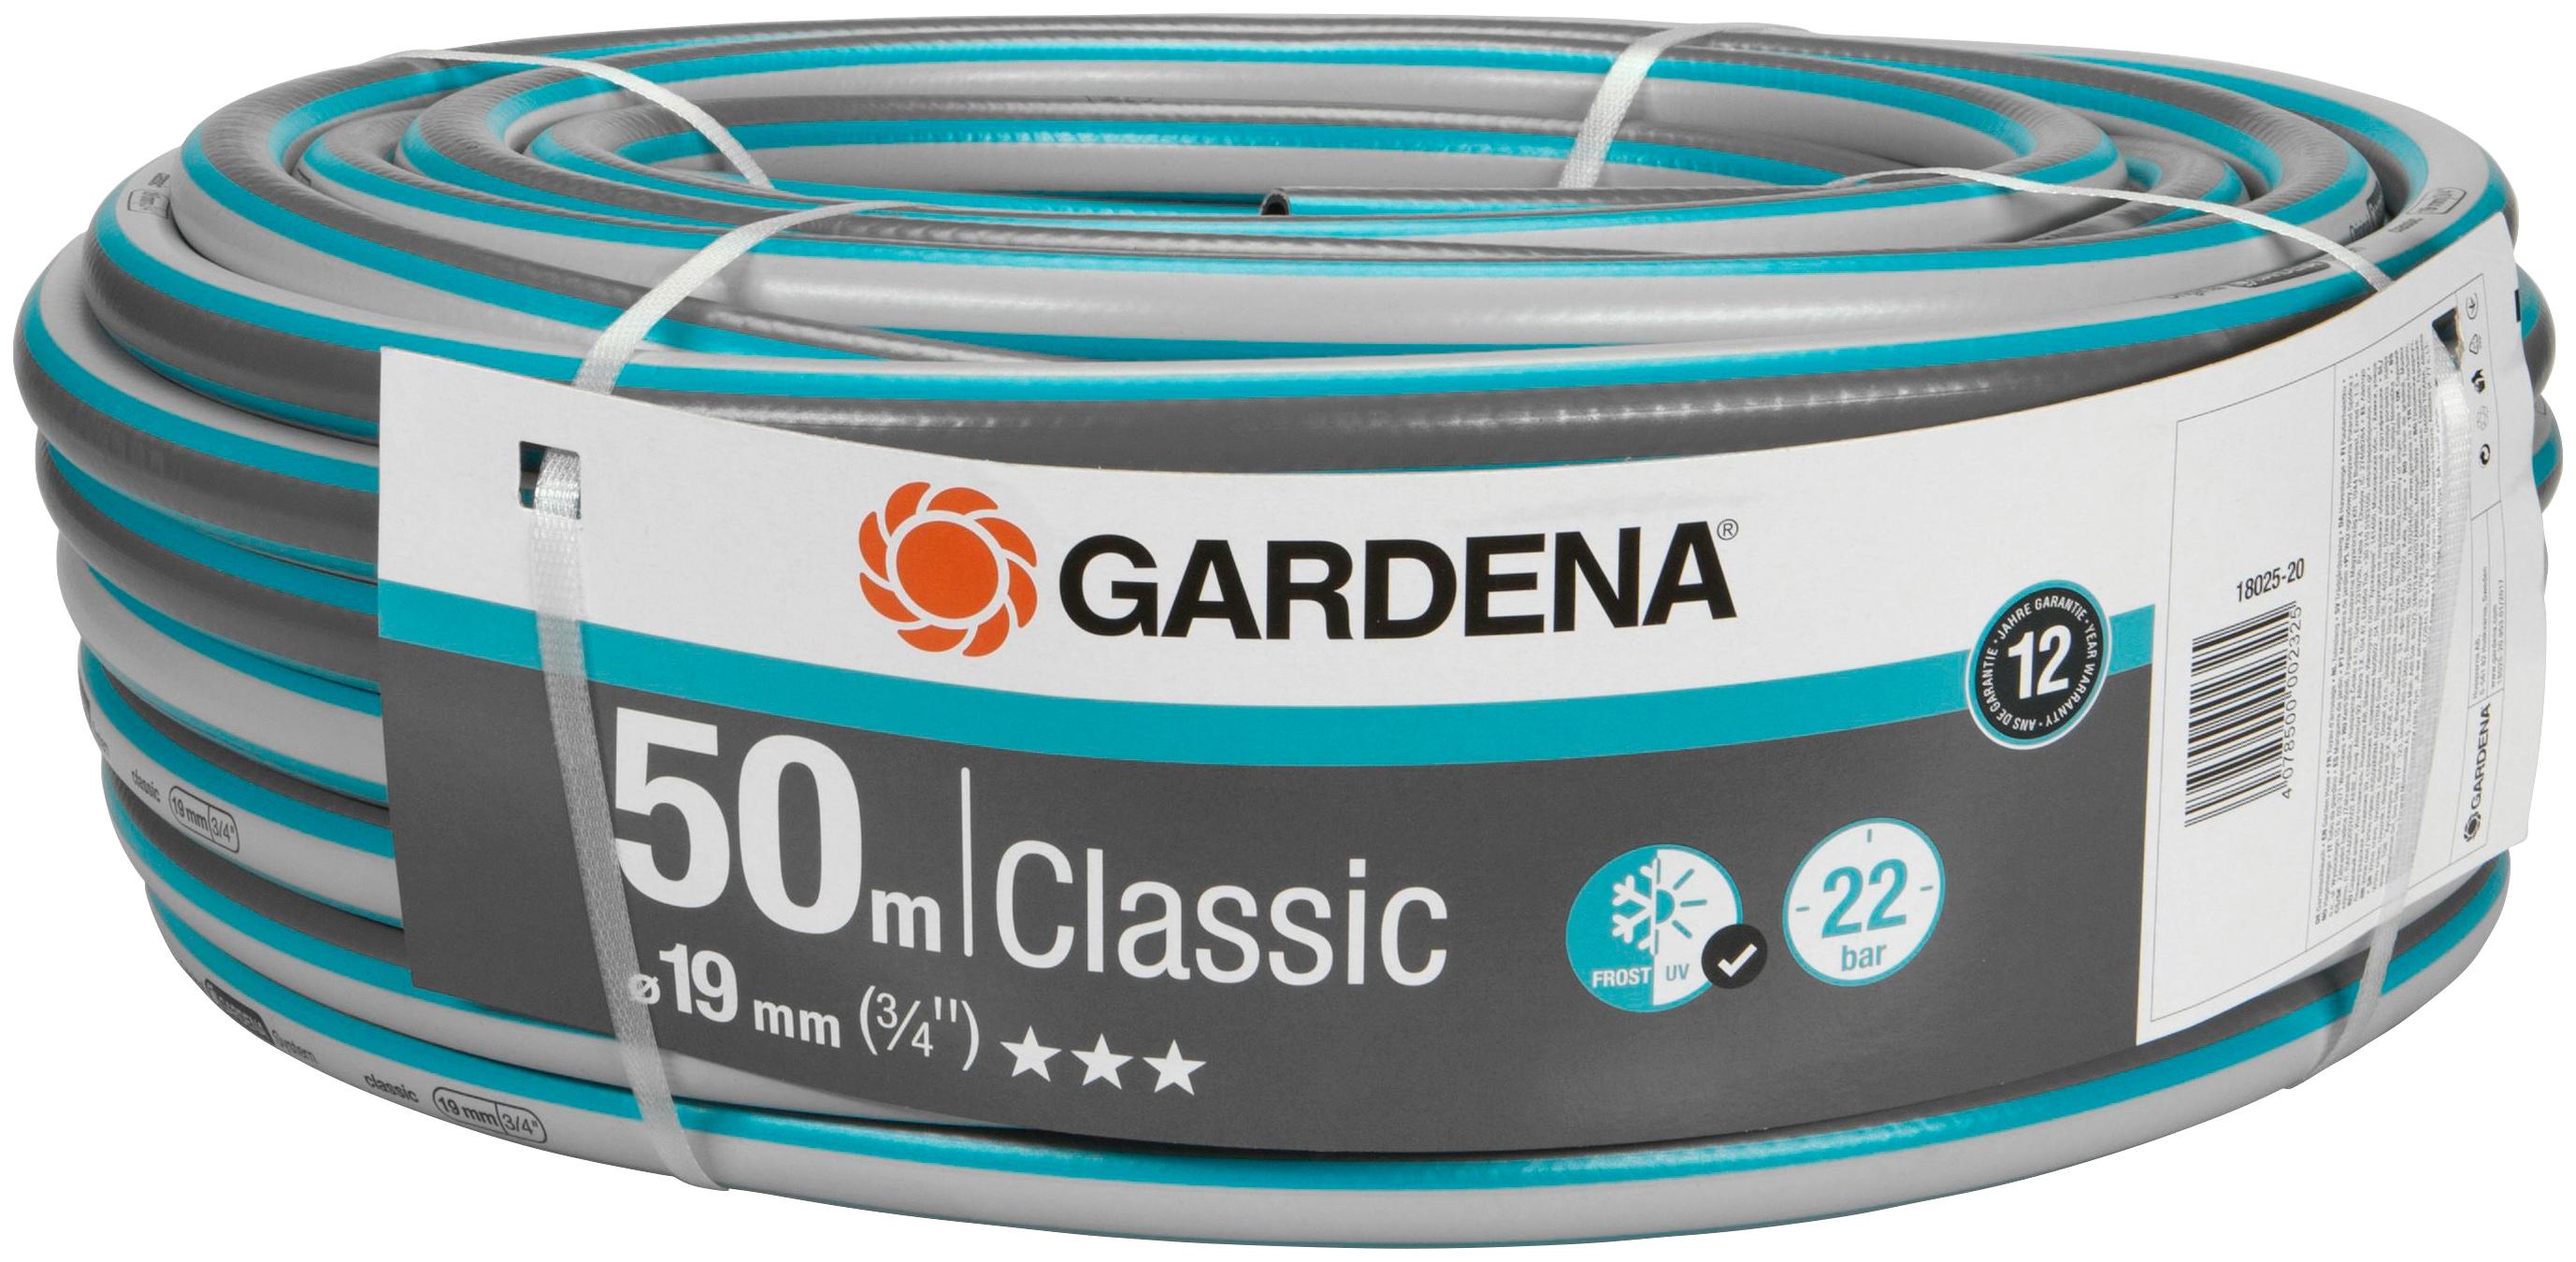 GARDENA Gartenschlauch »Classic, 18025-20«, 19 mm (3/4), 50 Meter | Garten > Garten-Duschen | Gardena